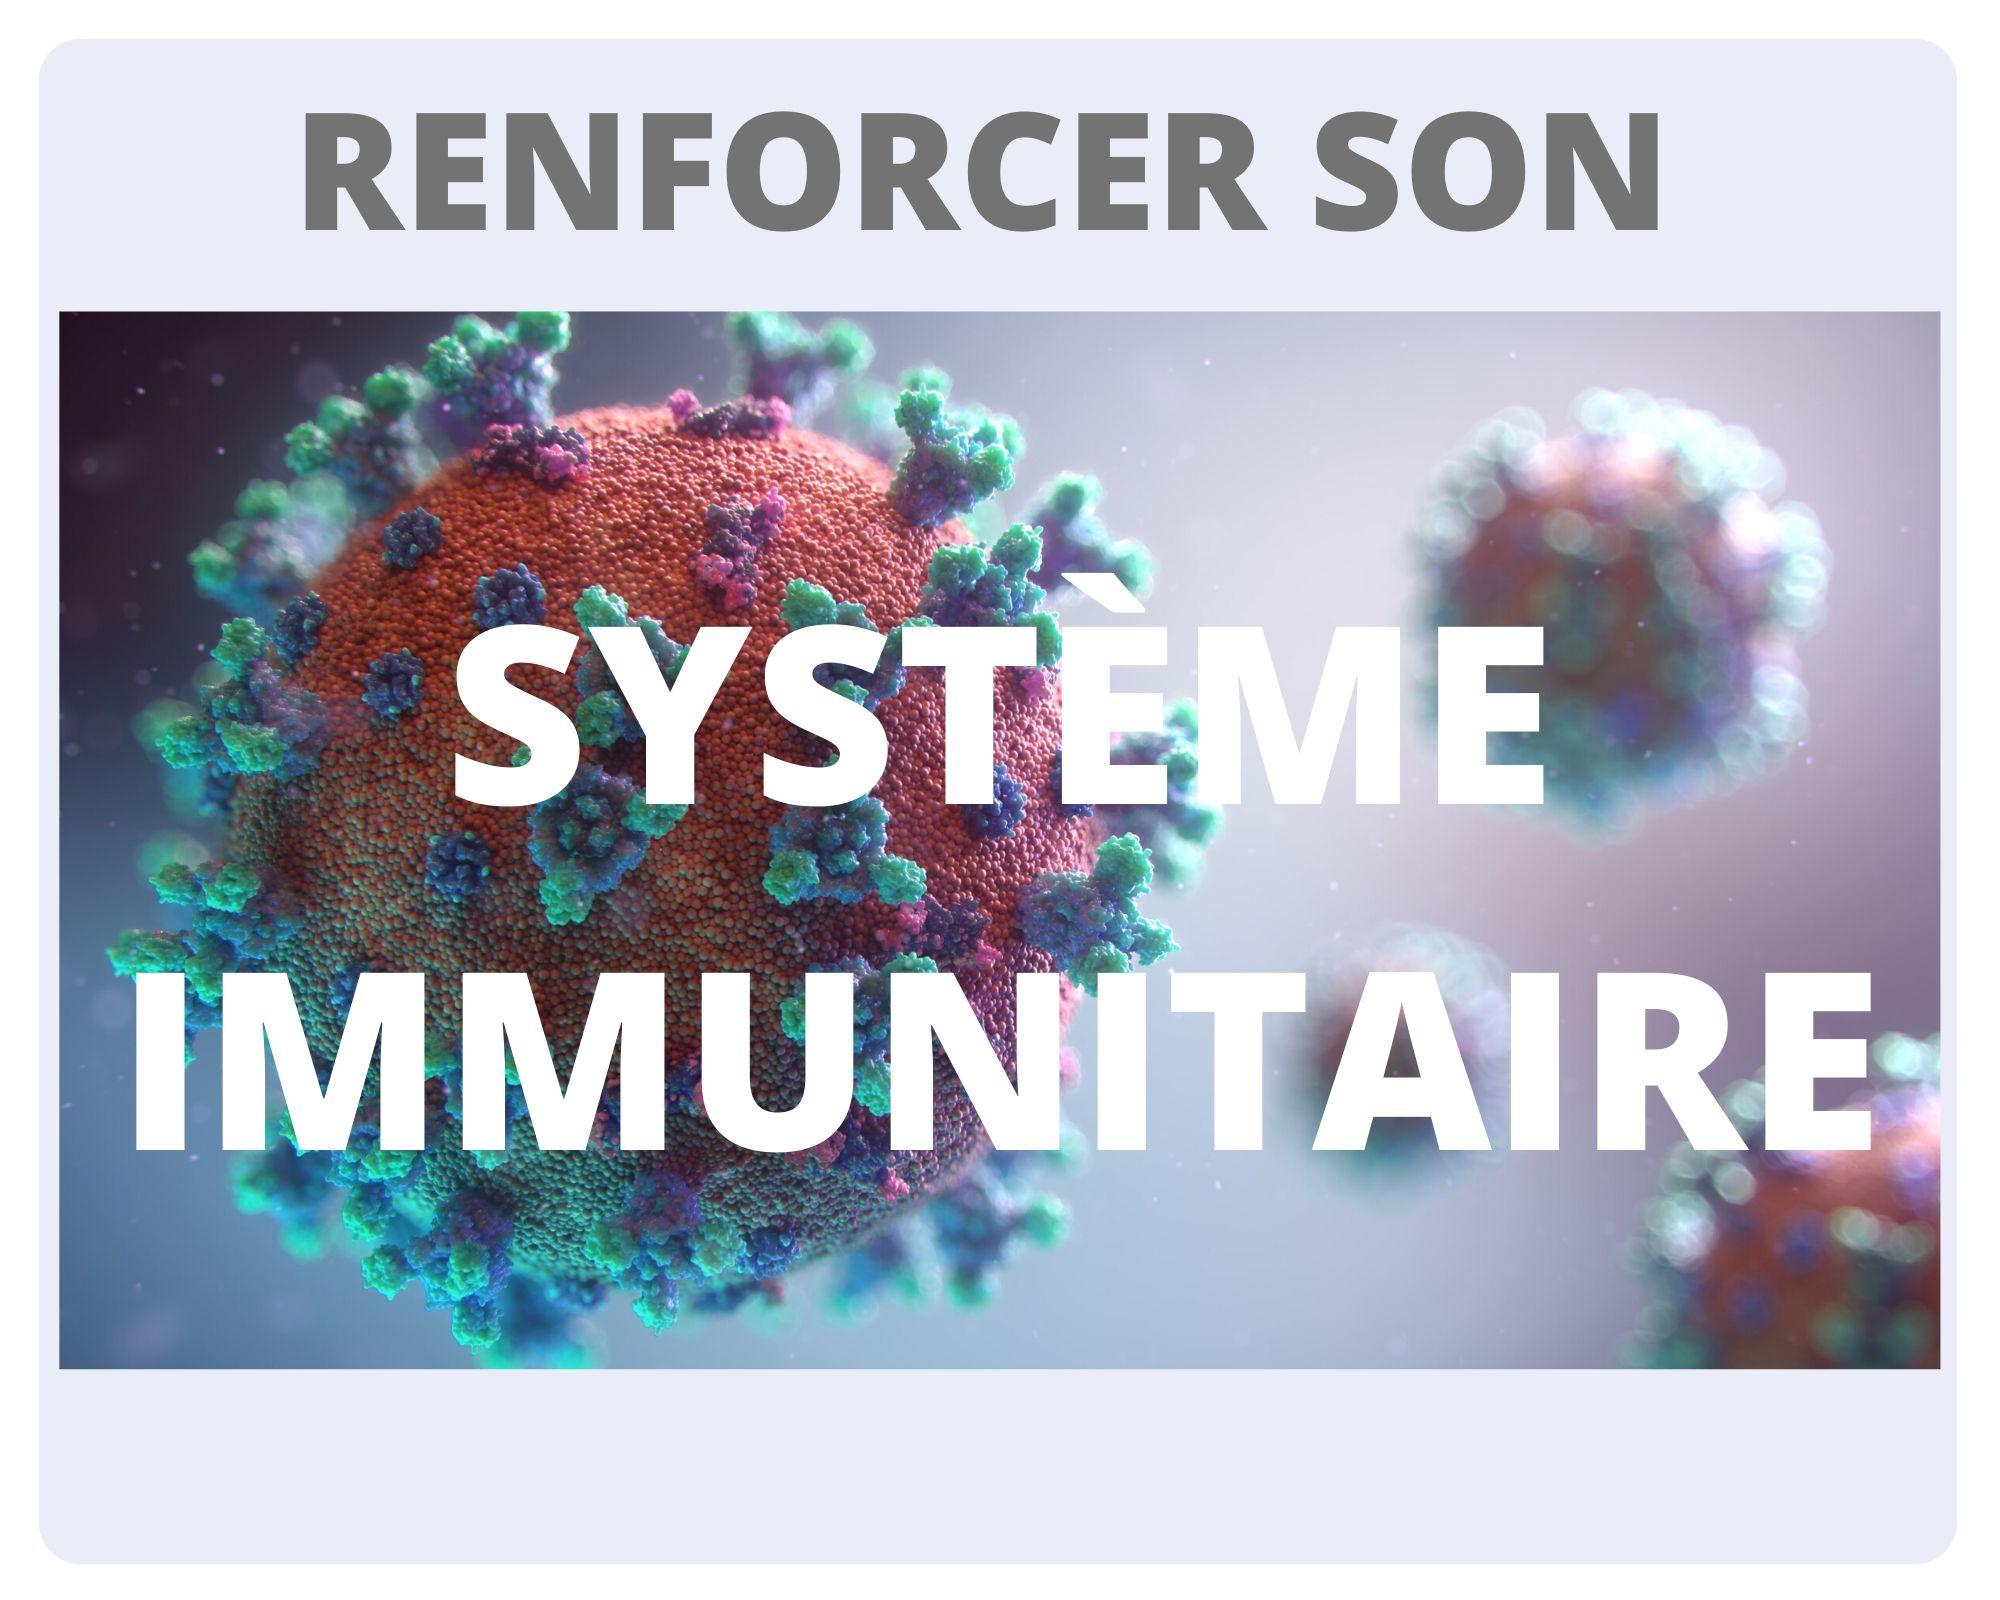 renforcer-son-système-immunitaire-melanie-mordogan-naturopathe